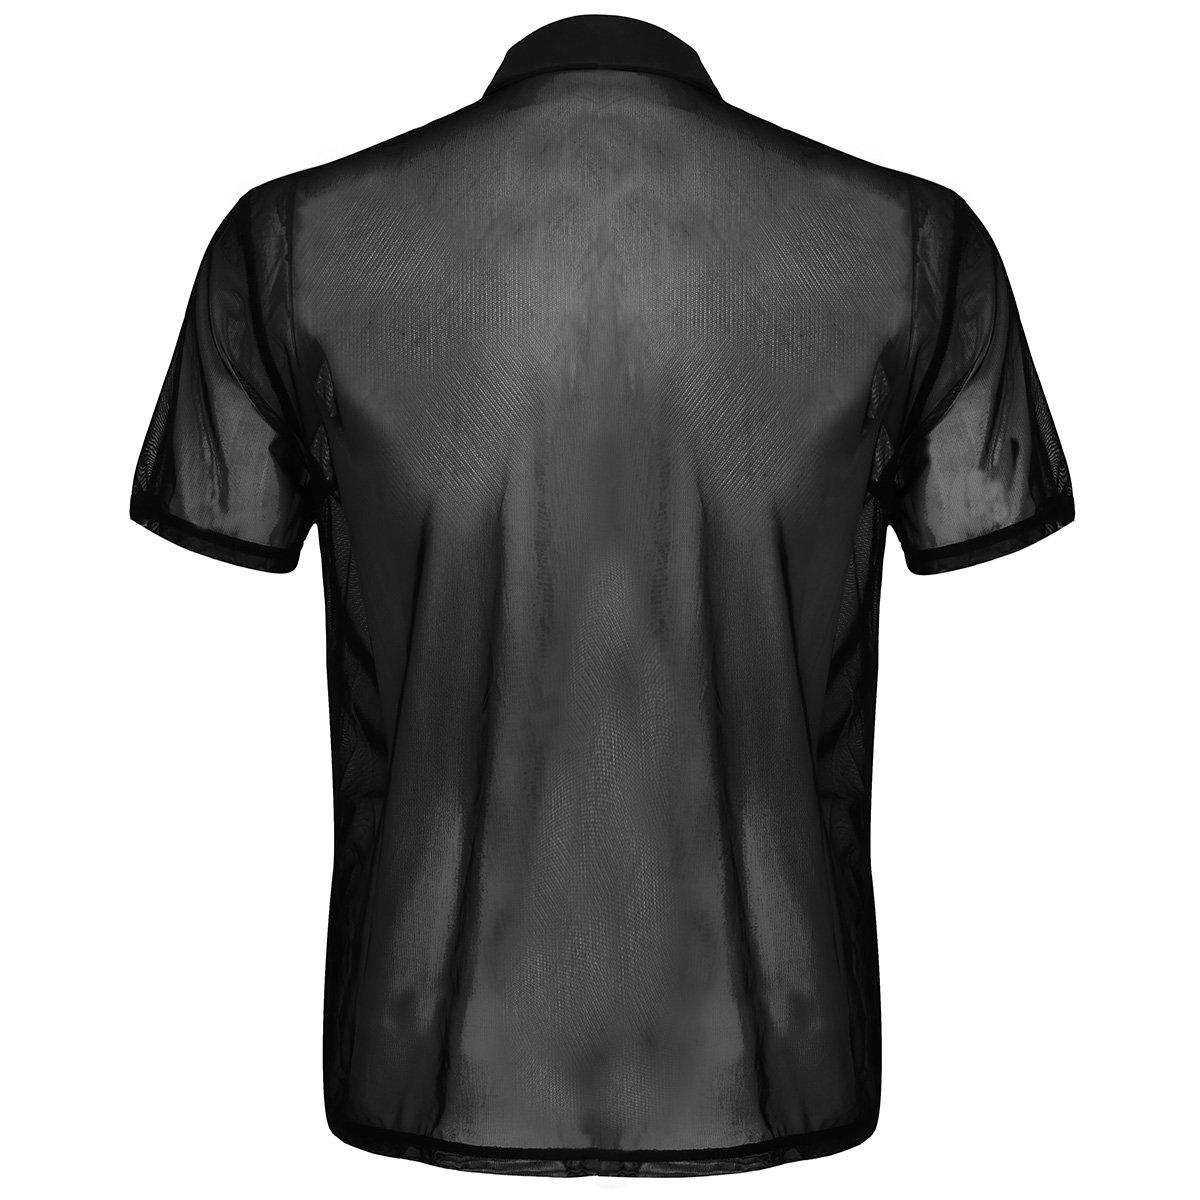 iiniim Herren Shirt Slim Fit Transparent Unterhemd T-Shirt Männer Tops  Unterwäsche Party Clubwear M-XL  Amazon.de  Bekleidung 353651c087